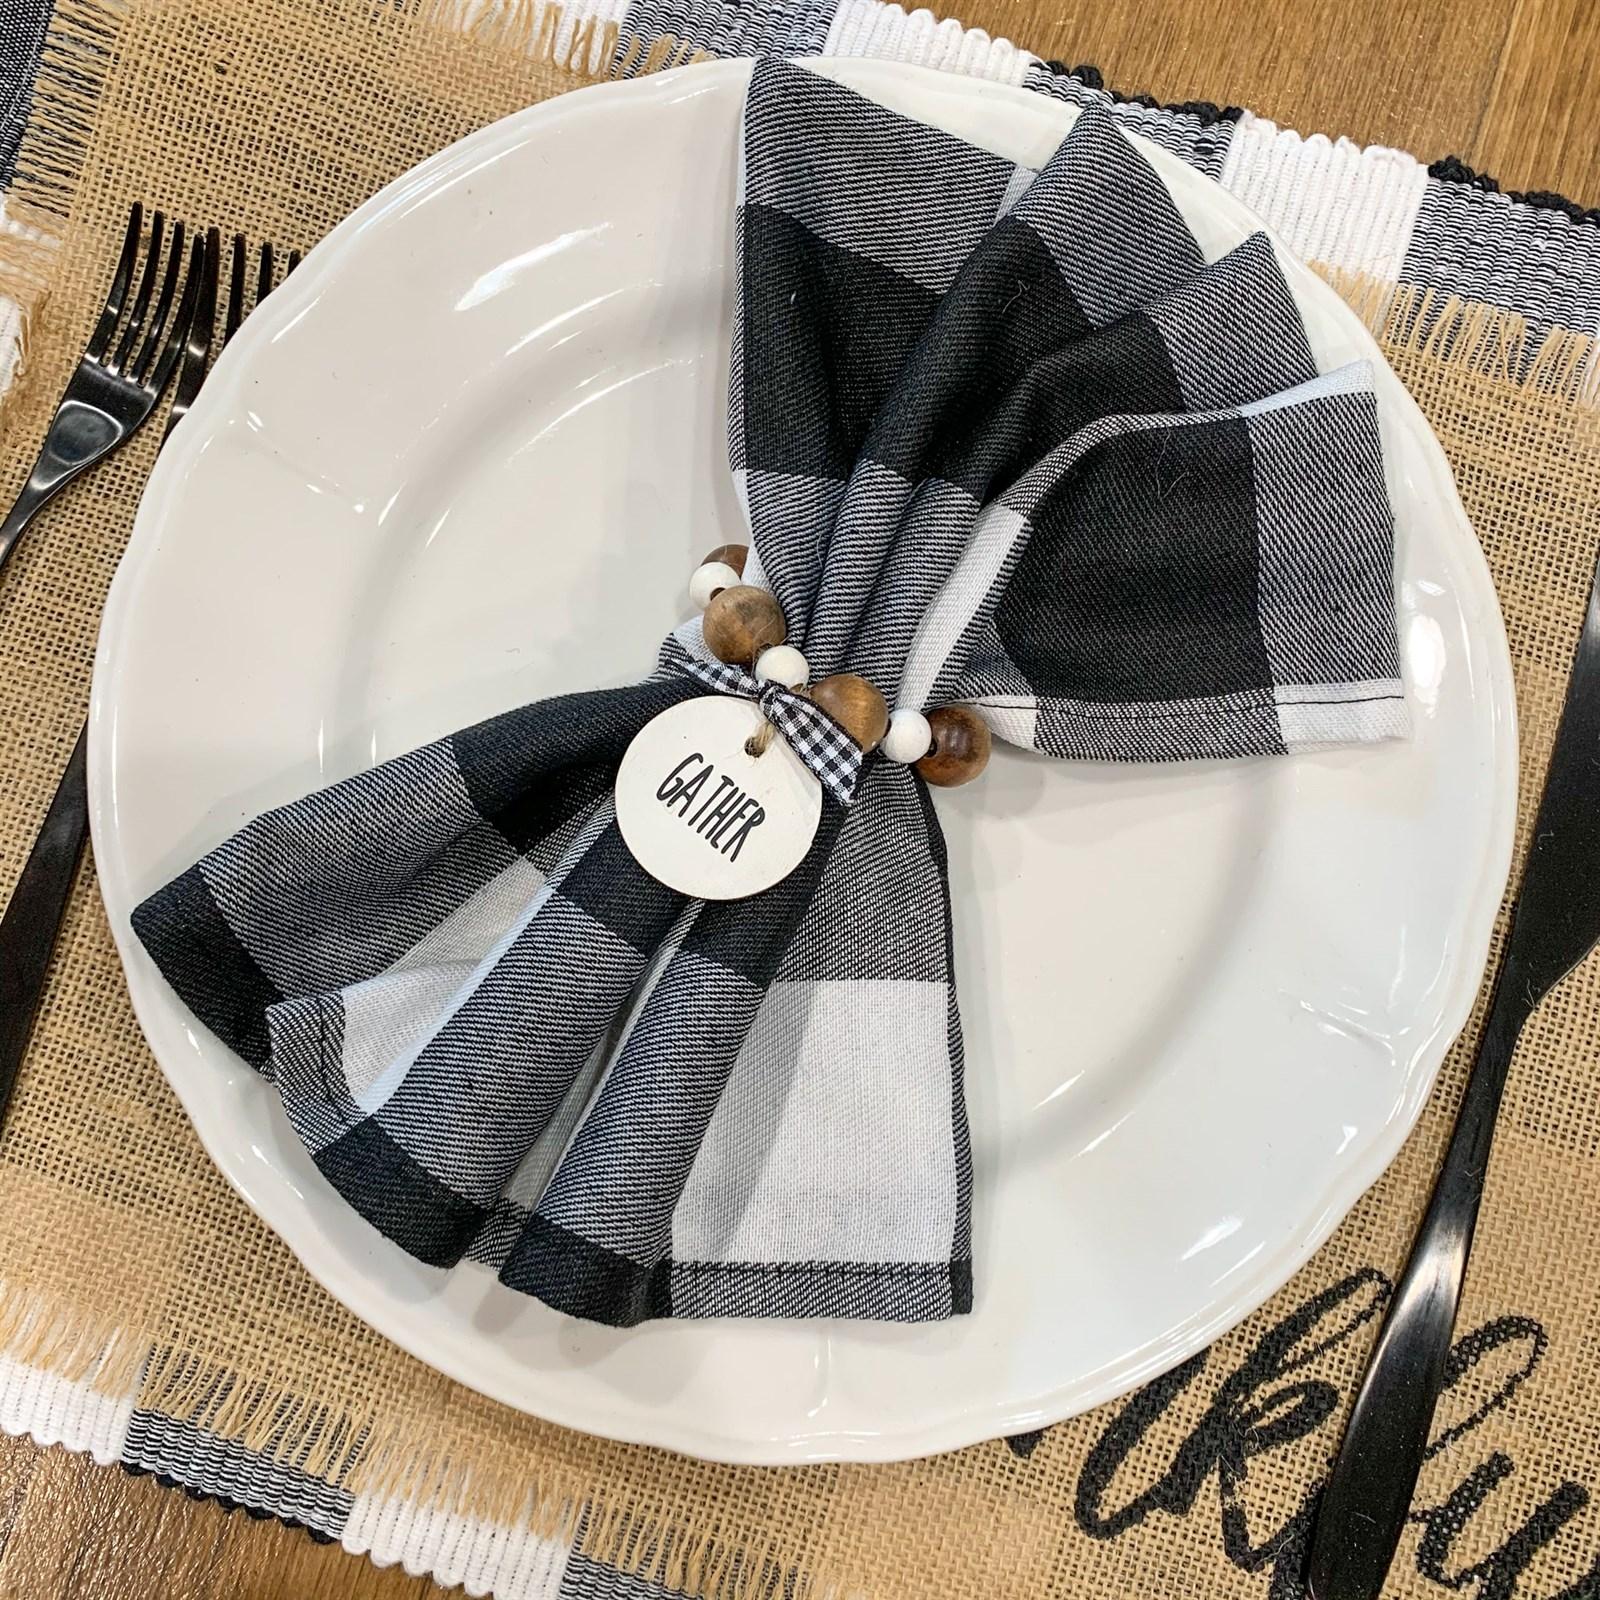 Farmhouse Holiday Napkin Ring Sets Jane